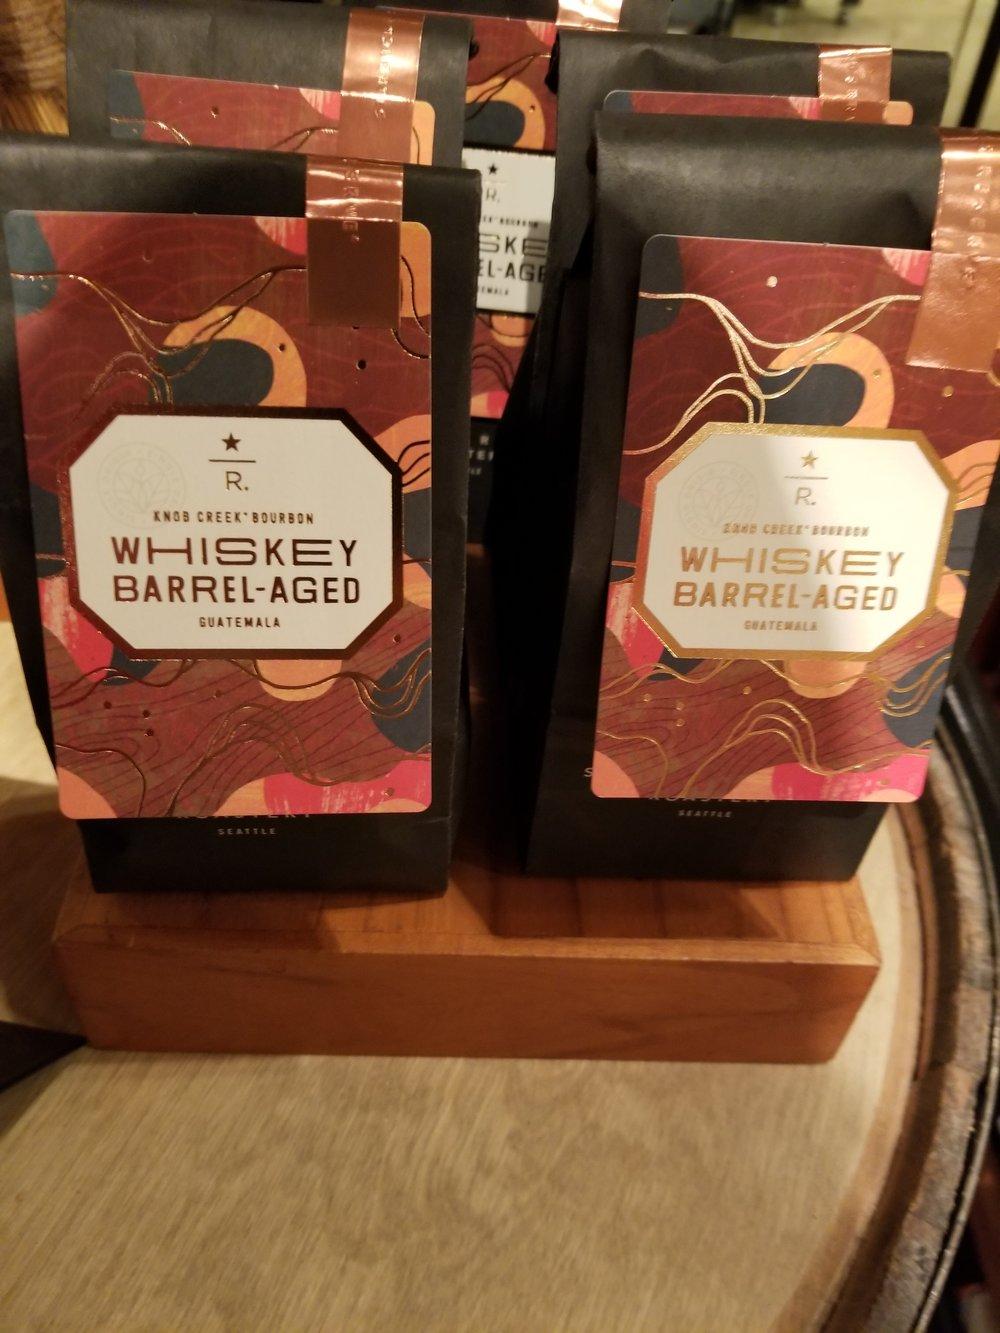 9.12.18 Whiskey Barrel Aged Guatemala at the Roastery.jpg